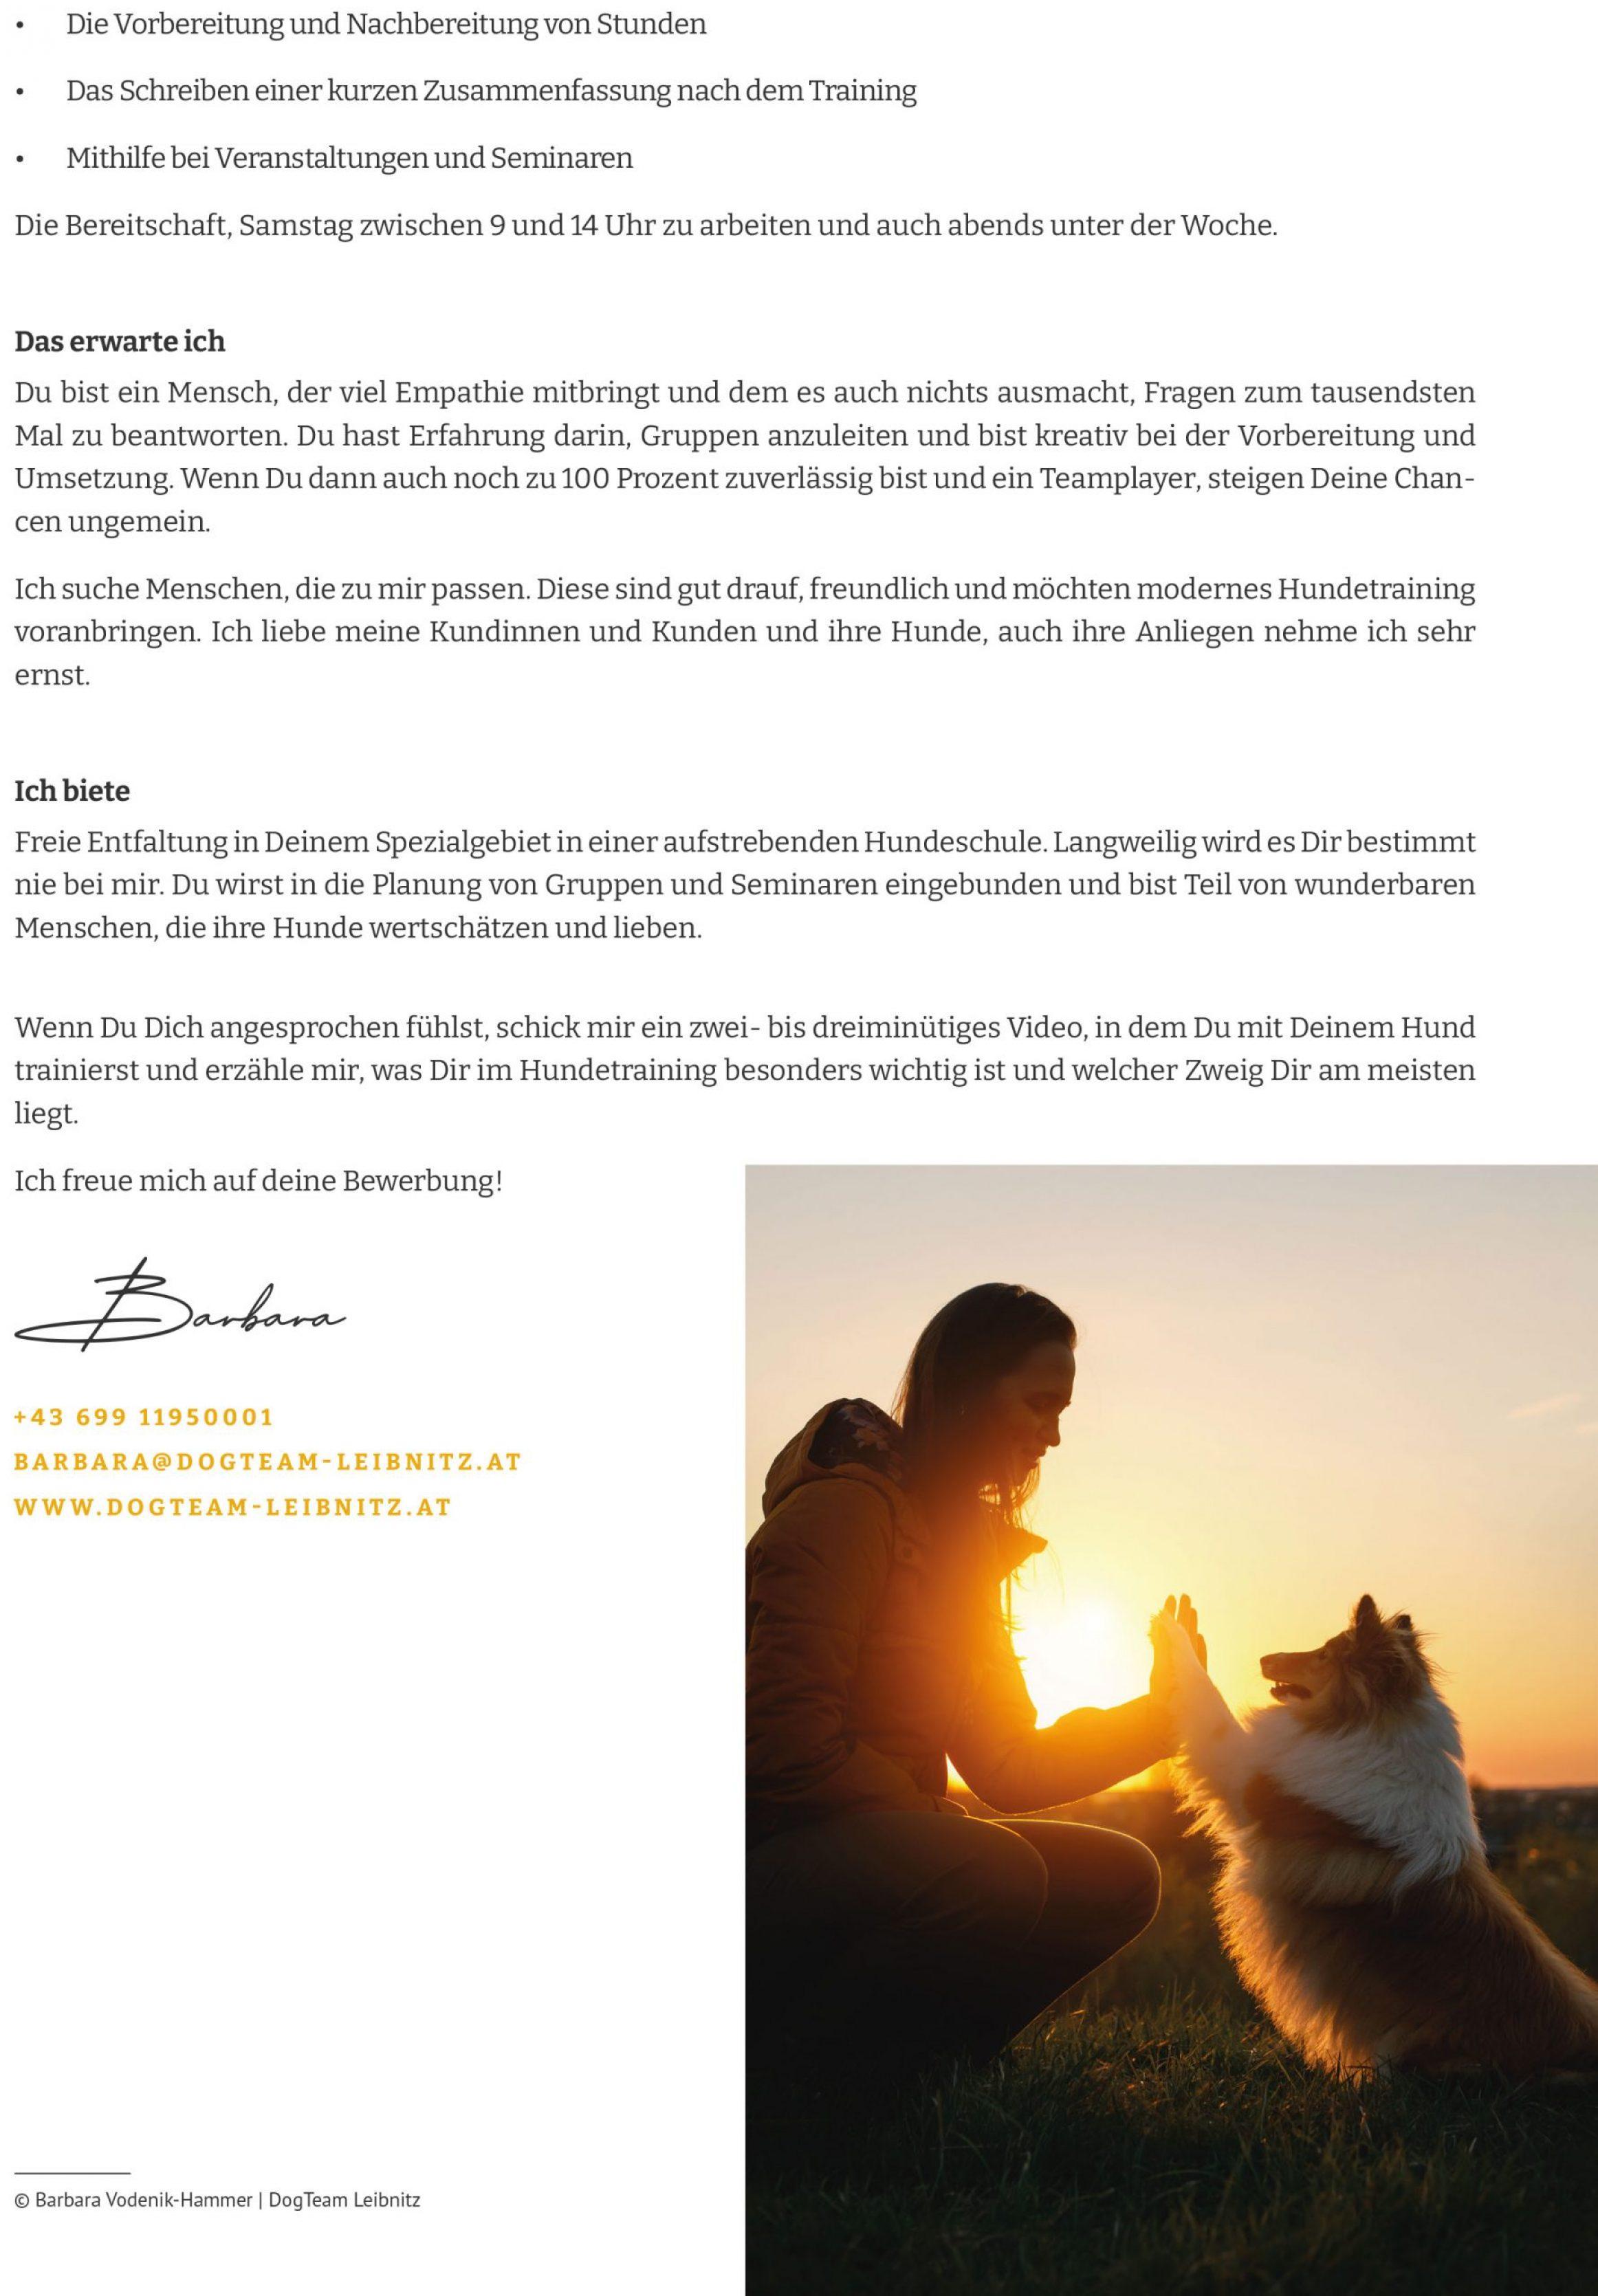 https://www.dogteam-leibnitz.at/wp-content/uploads/2021/08/DogTeam_Stellenausschreibung_final-2-scaled-2324x3340.jpg